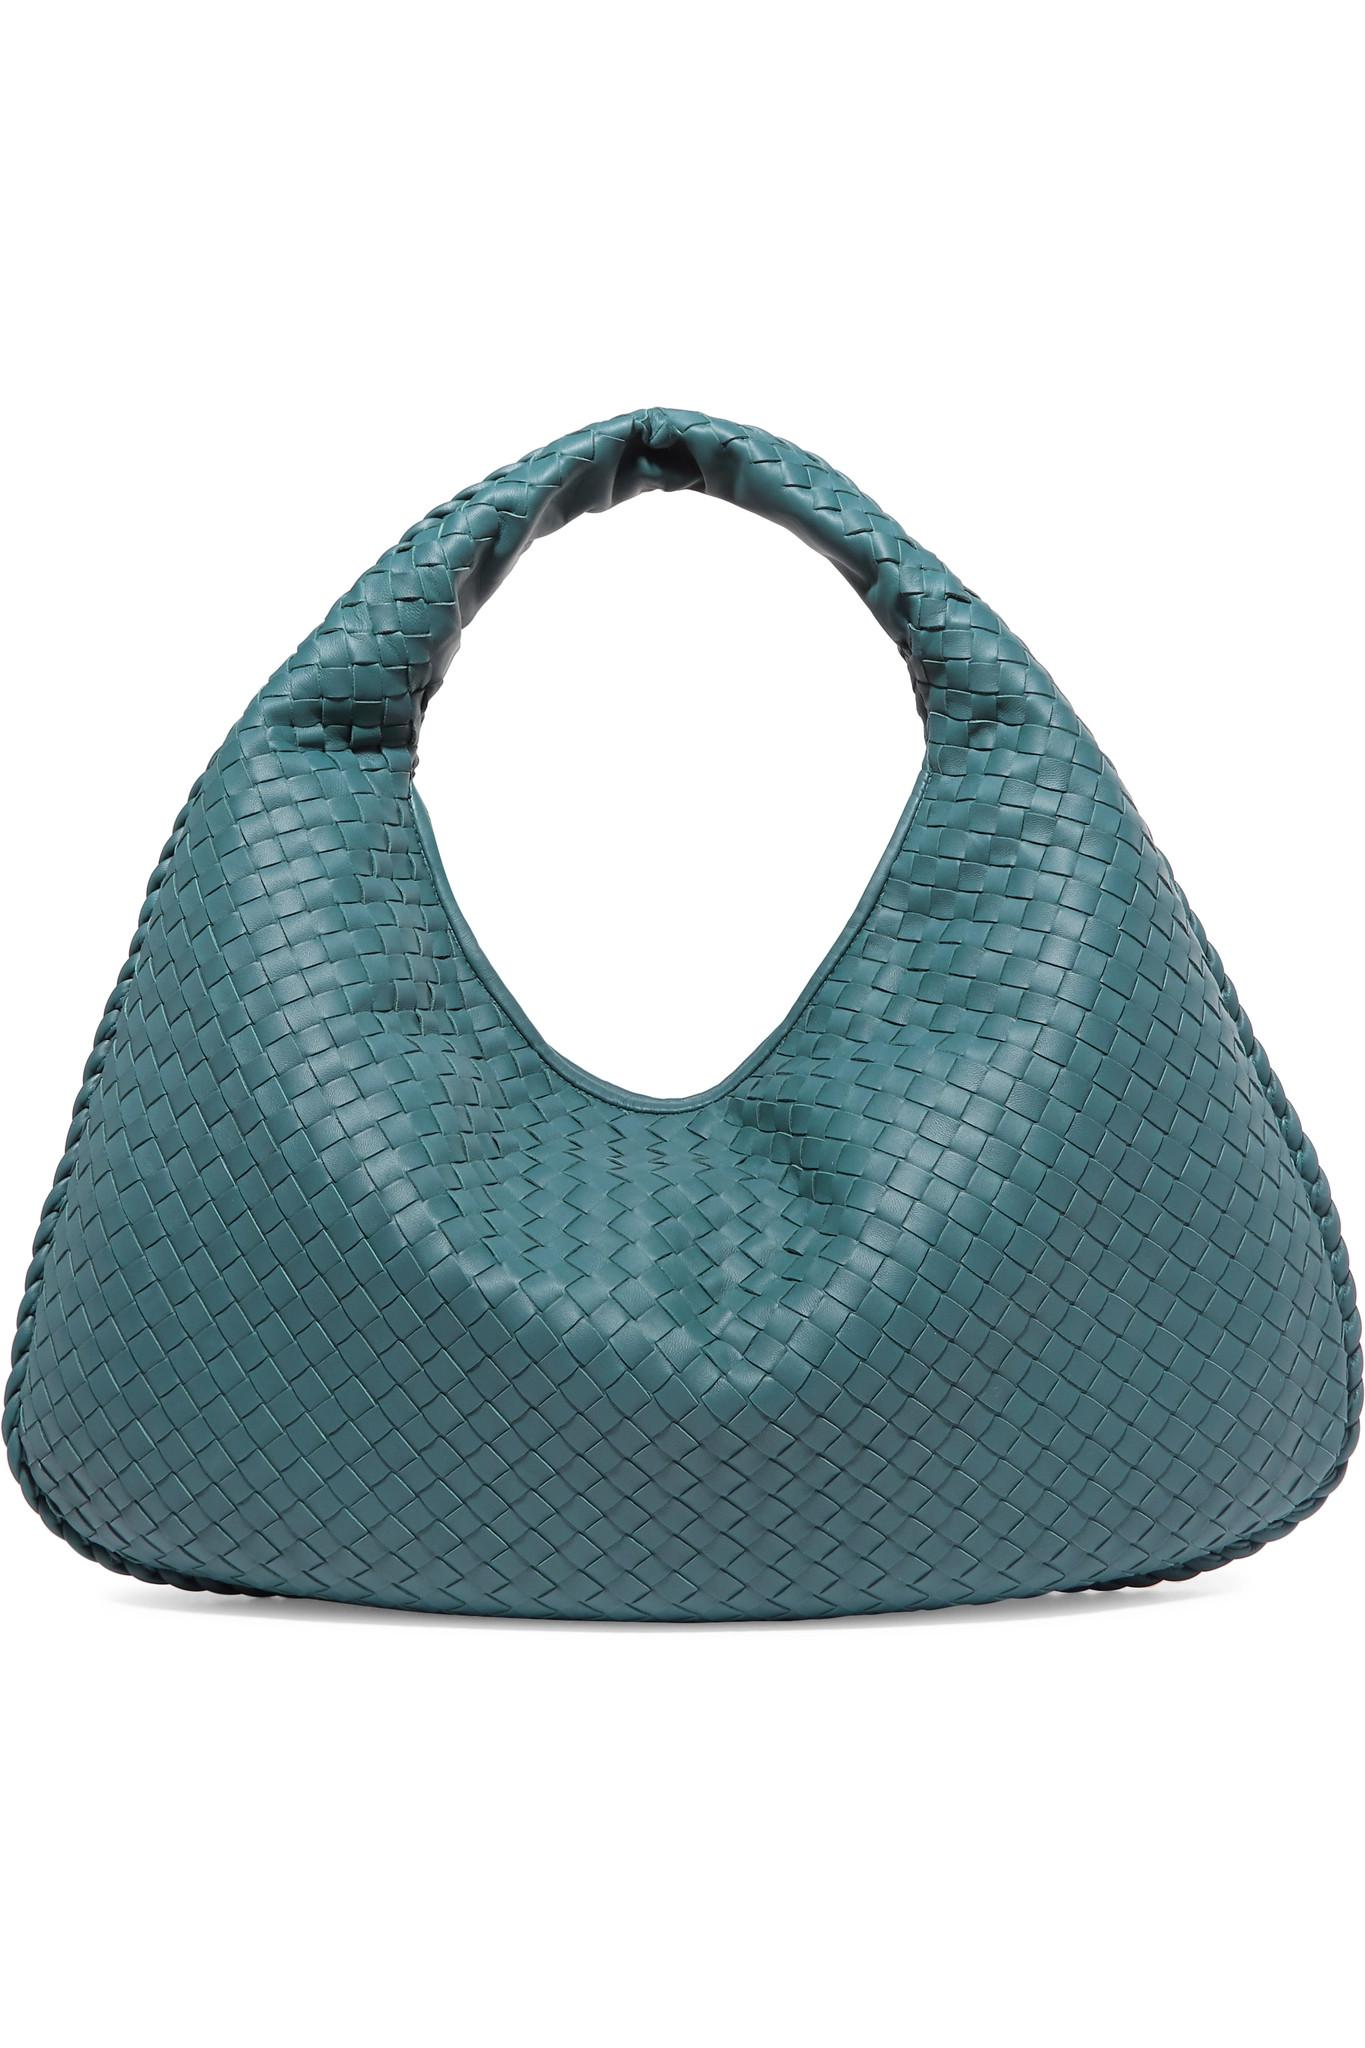 Bottega Veneta. Women s Blue Veneta Large Intrecciato Leather Shoulder Bag 05de5ed9f980c